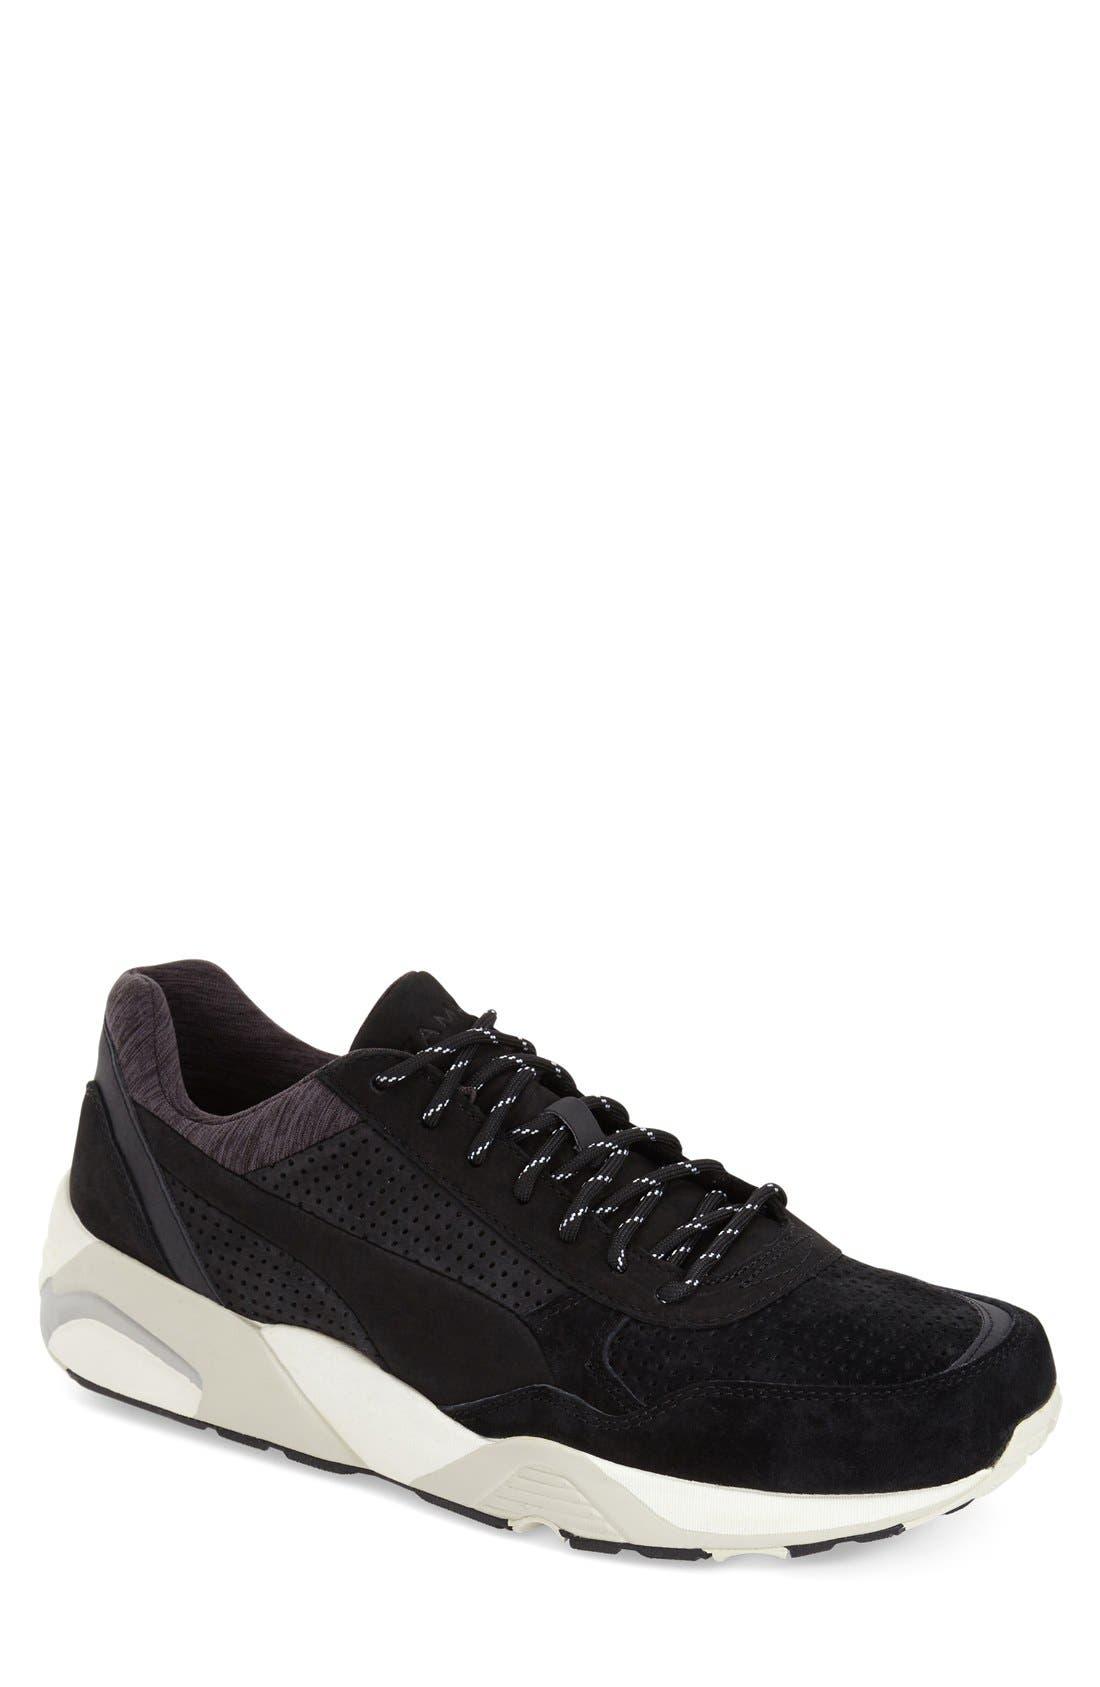 PUMA 'R698 X STAMPD' Sneaker (Men)